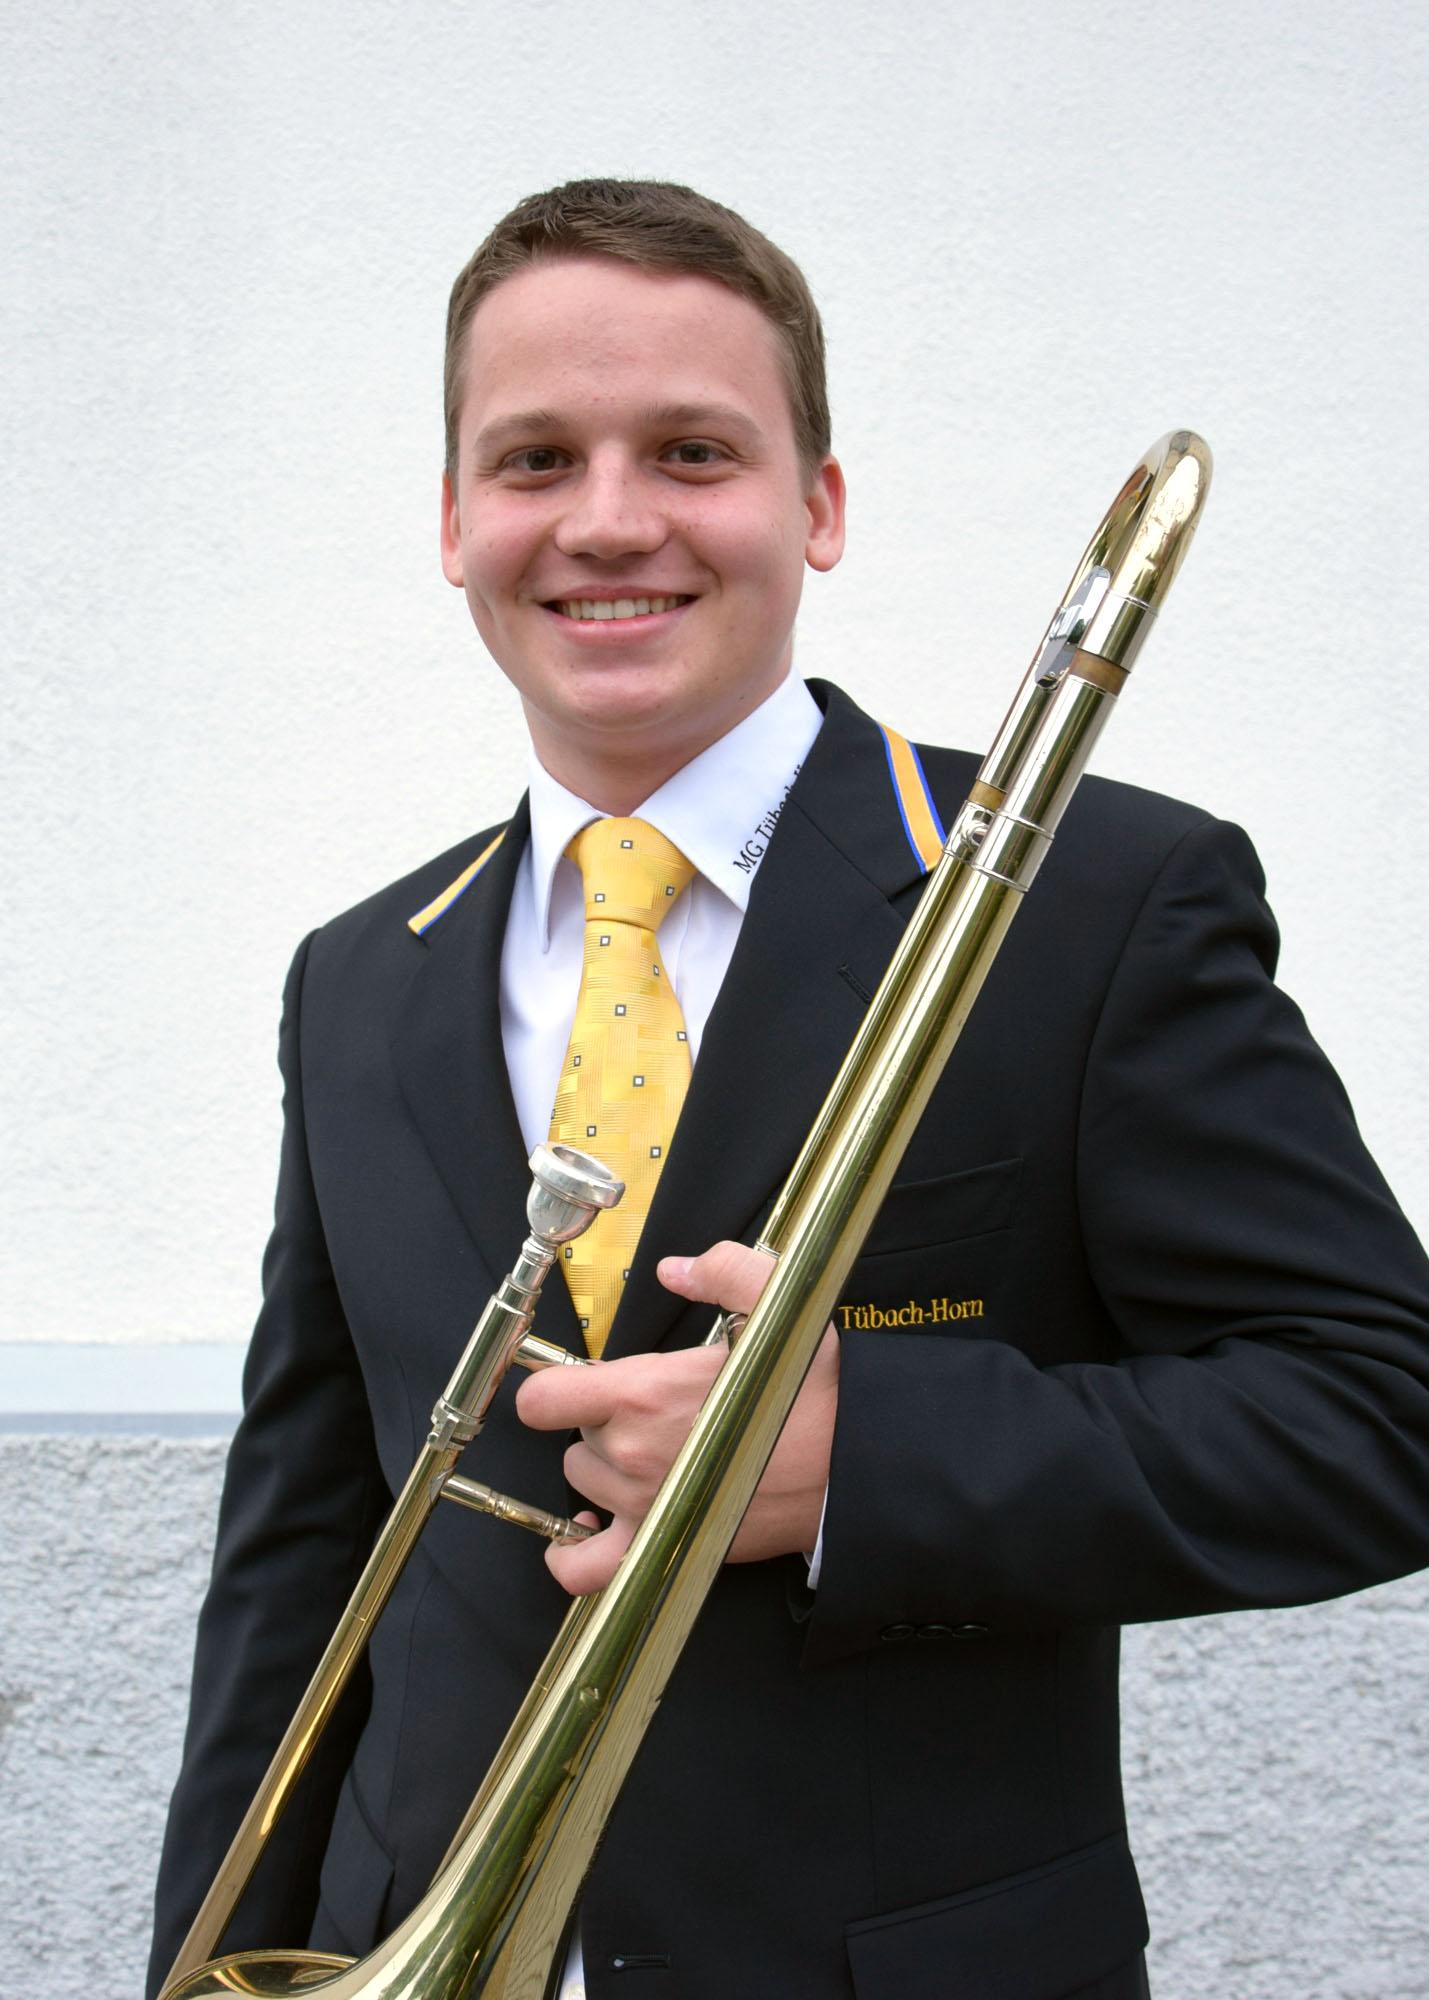 Marco Germann